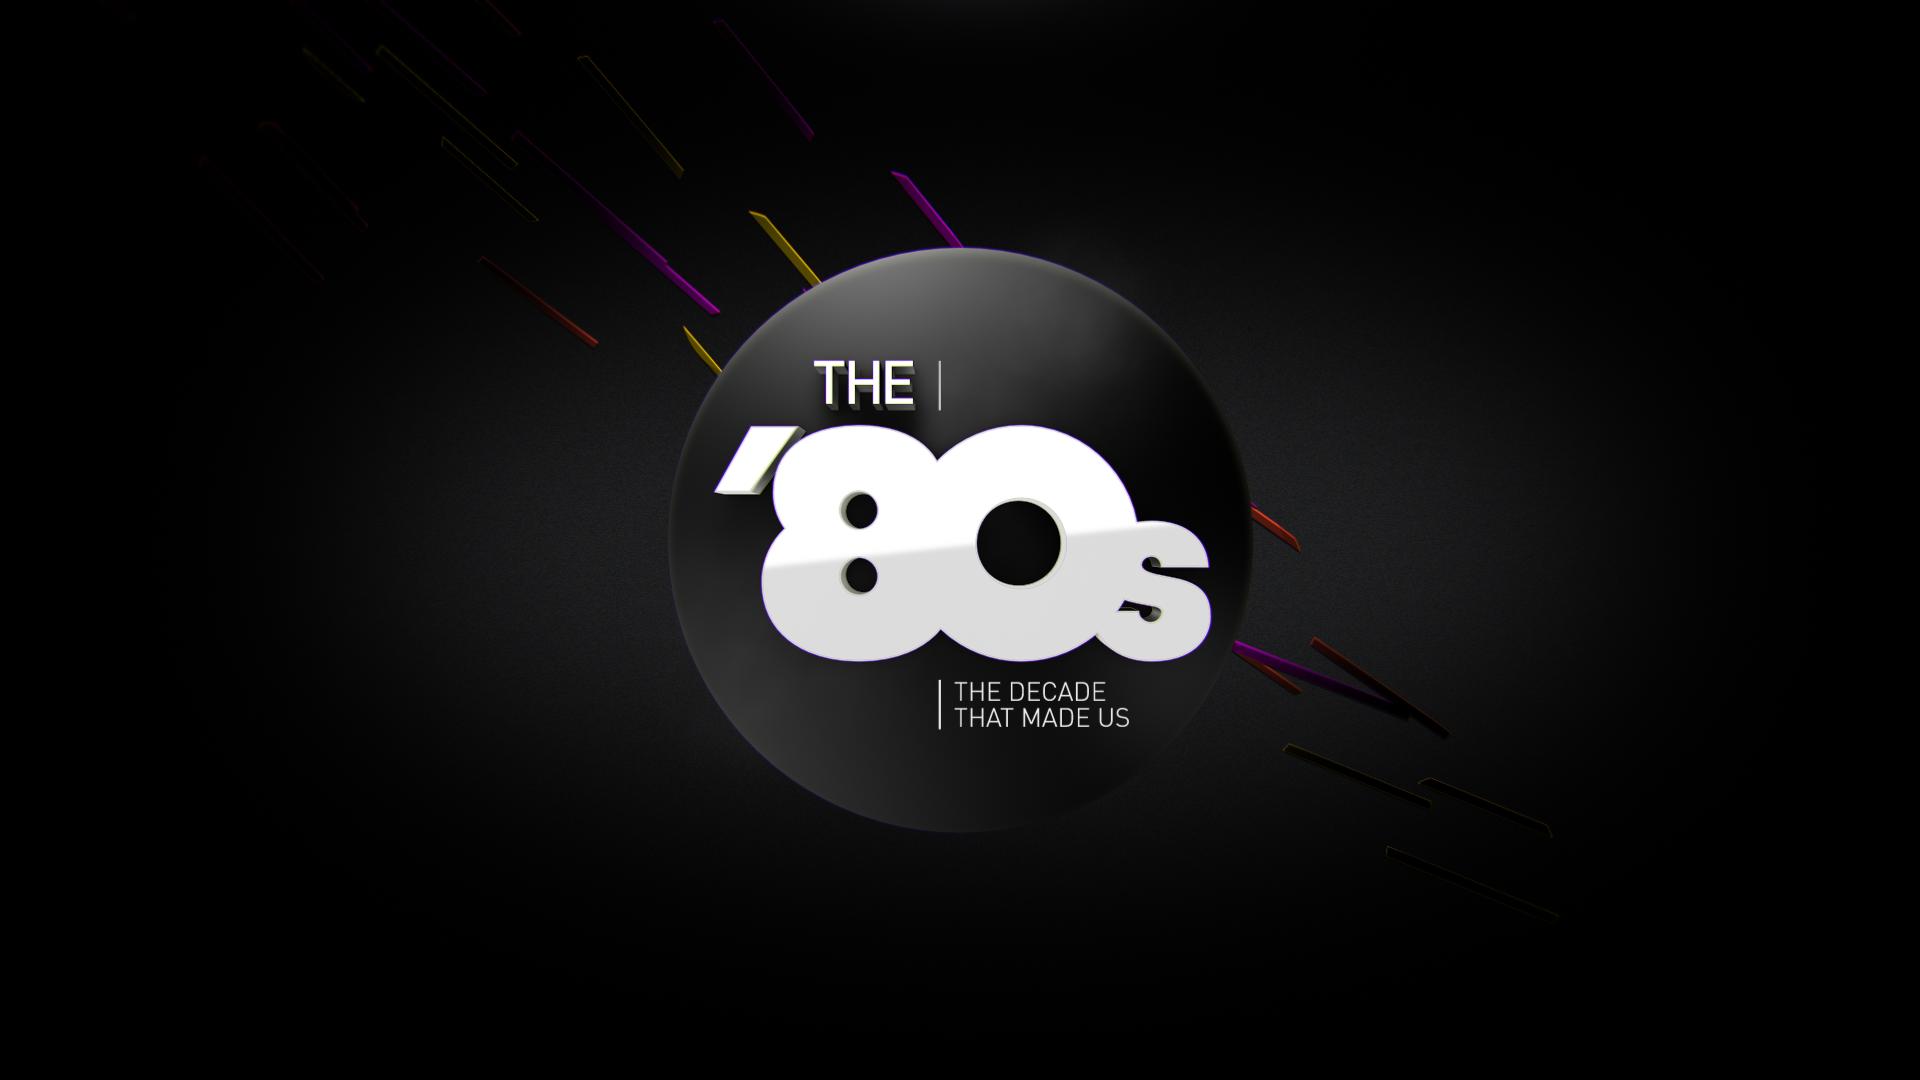 NatGeo_The80s_017.png